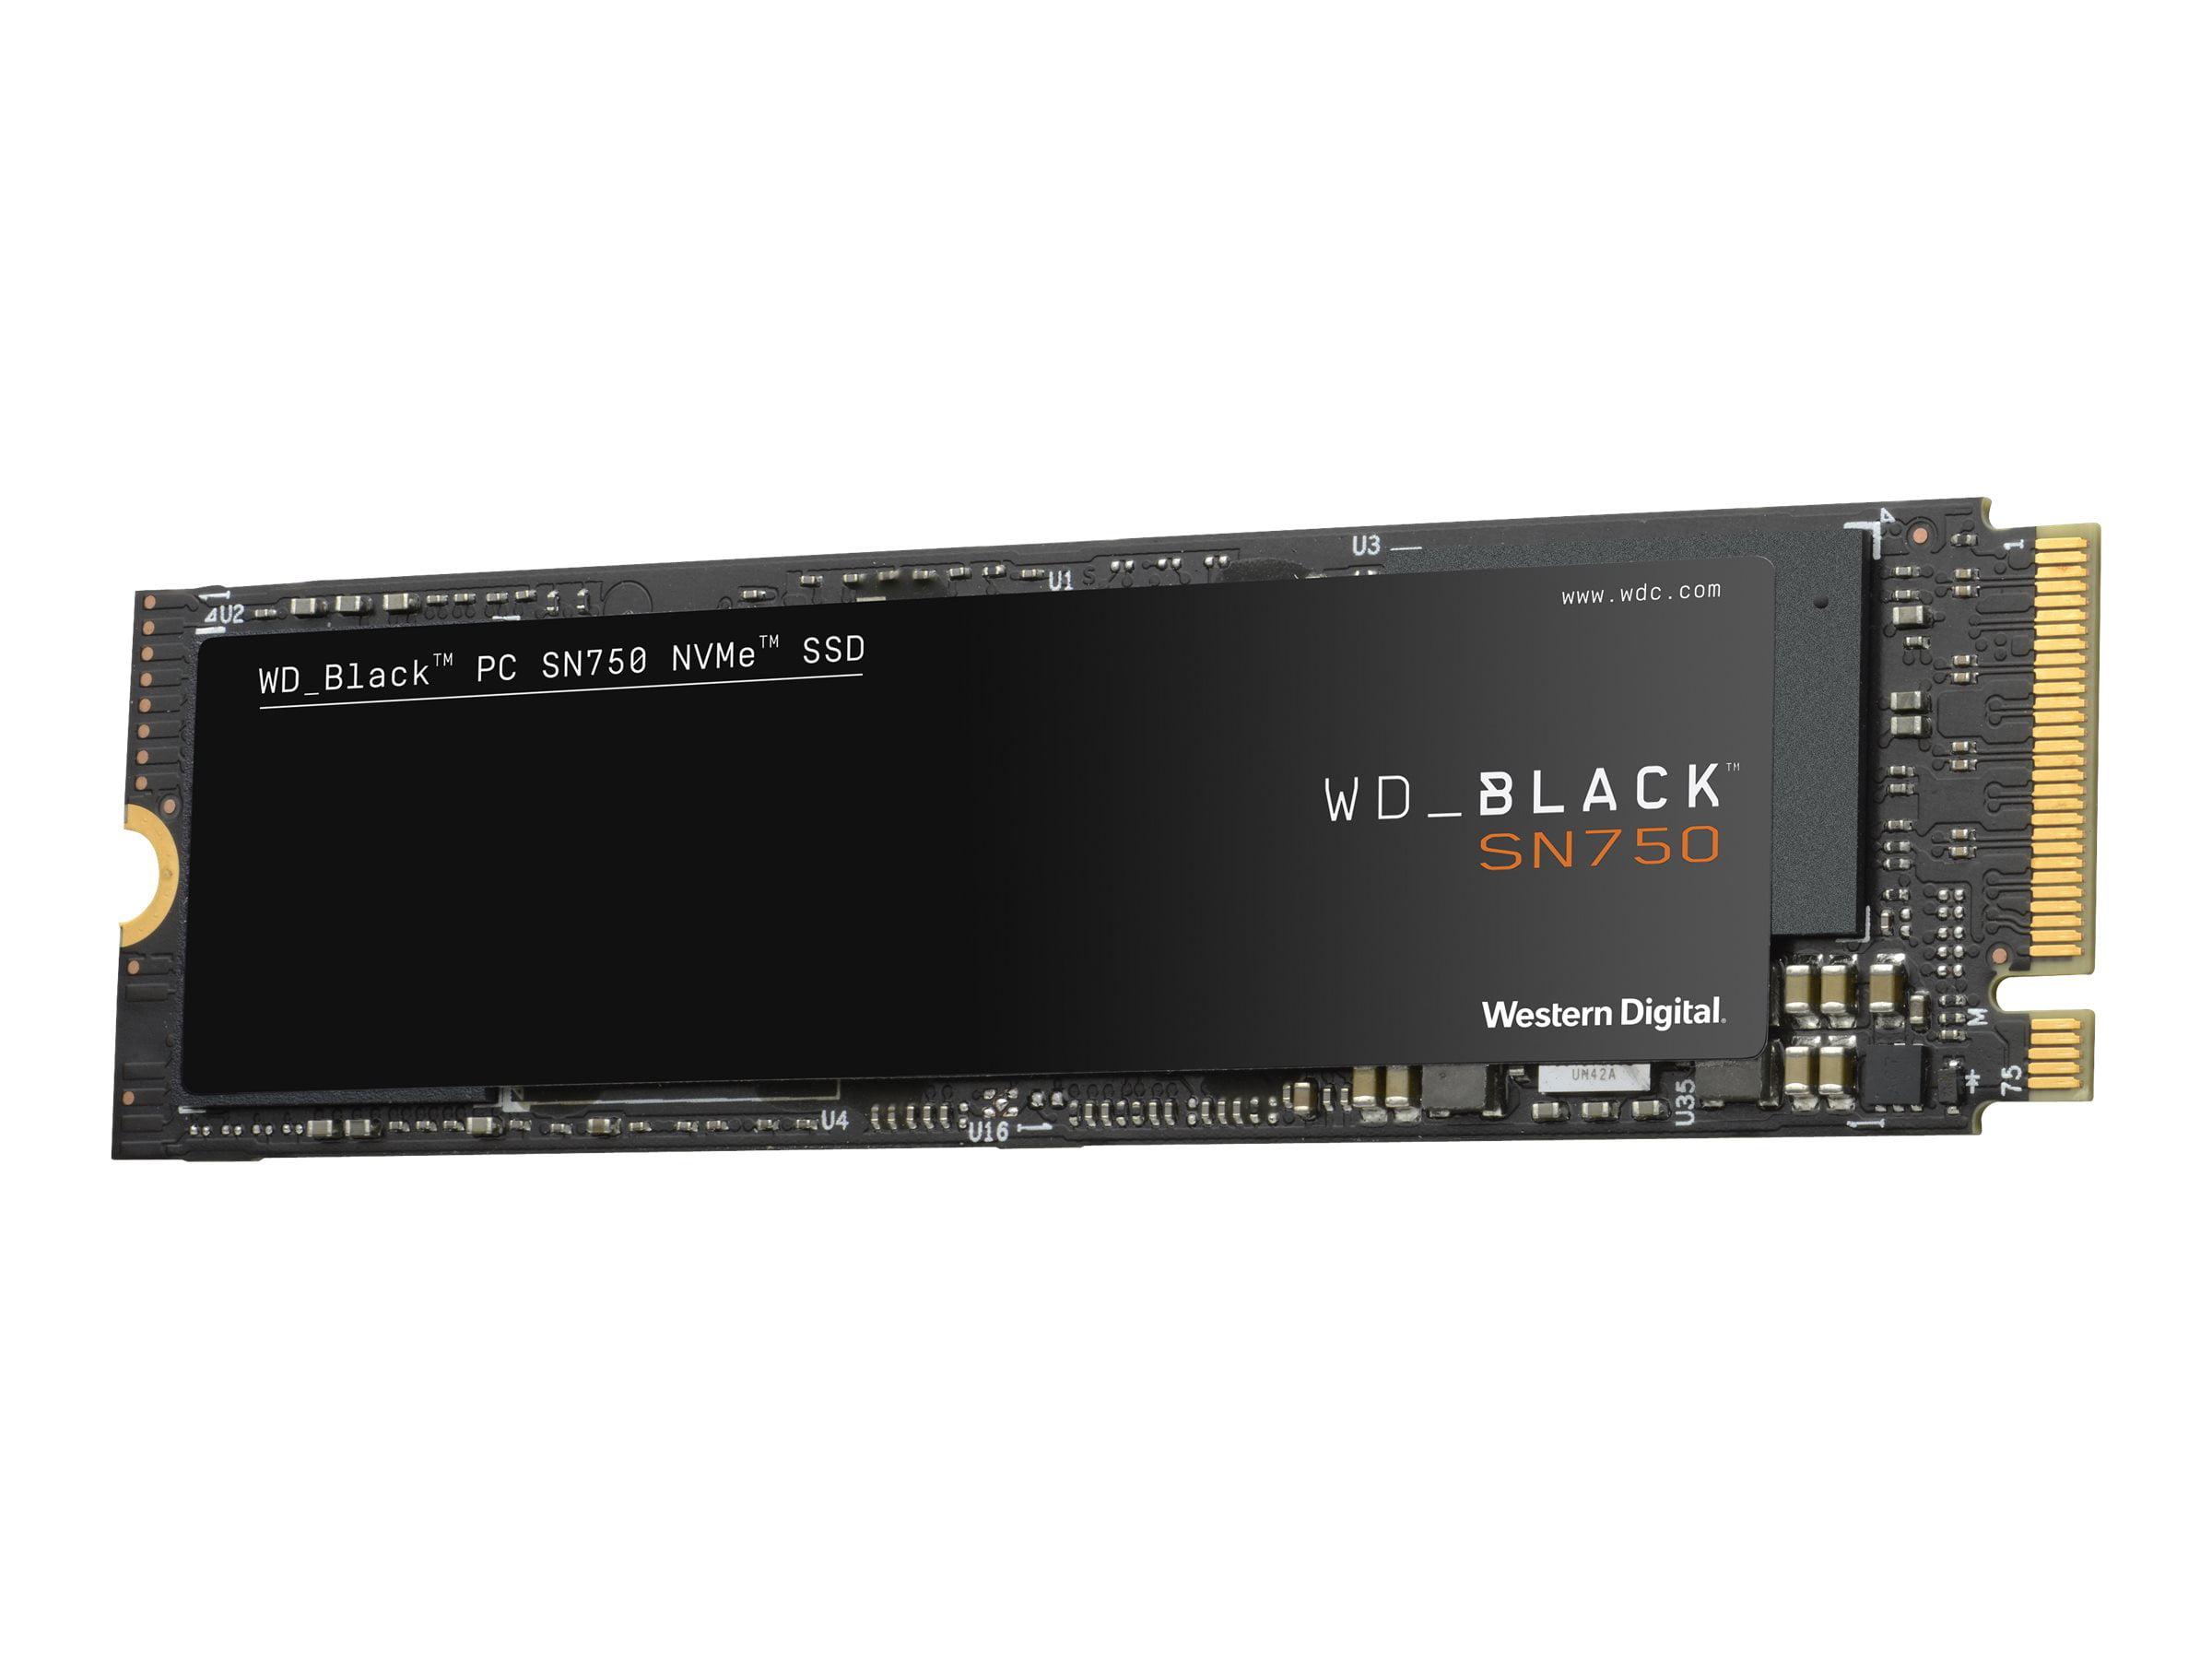 WD Black SN750 NVMe SSD WDBRPG0010BNC - Solid state drive - 1 TB - internal - M.2 2280 - PCI Express 3.0 x4 (NVMe)